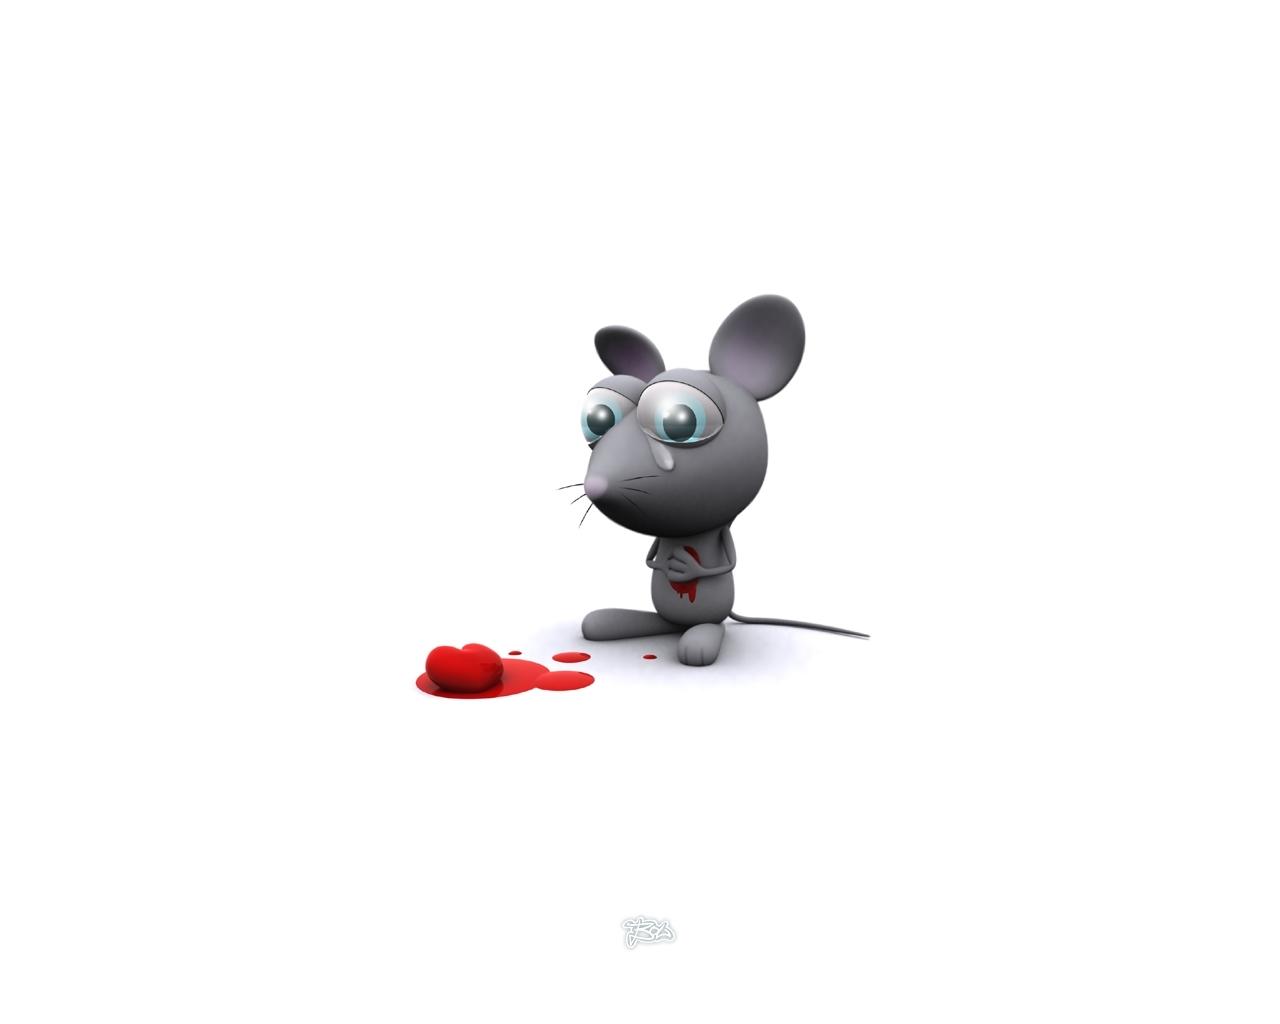 2763 descargar fondo de pantalla Ratones, Amor, Imágenes: protectores de pantalla e imágenes gratis